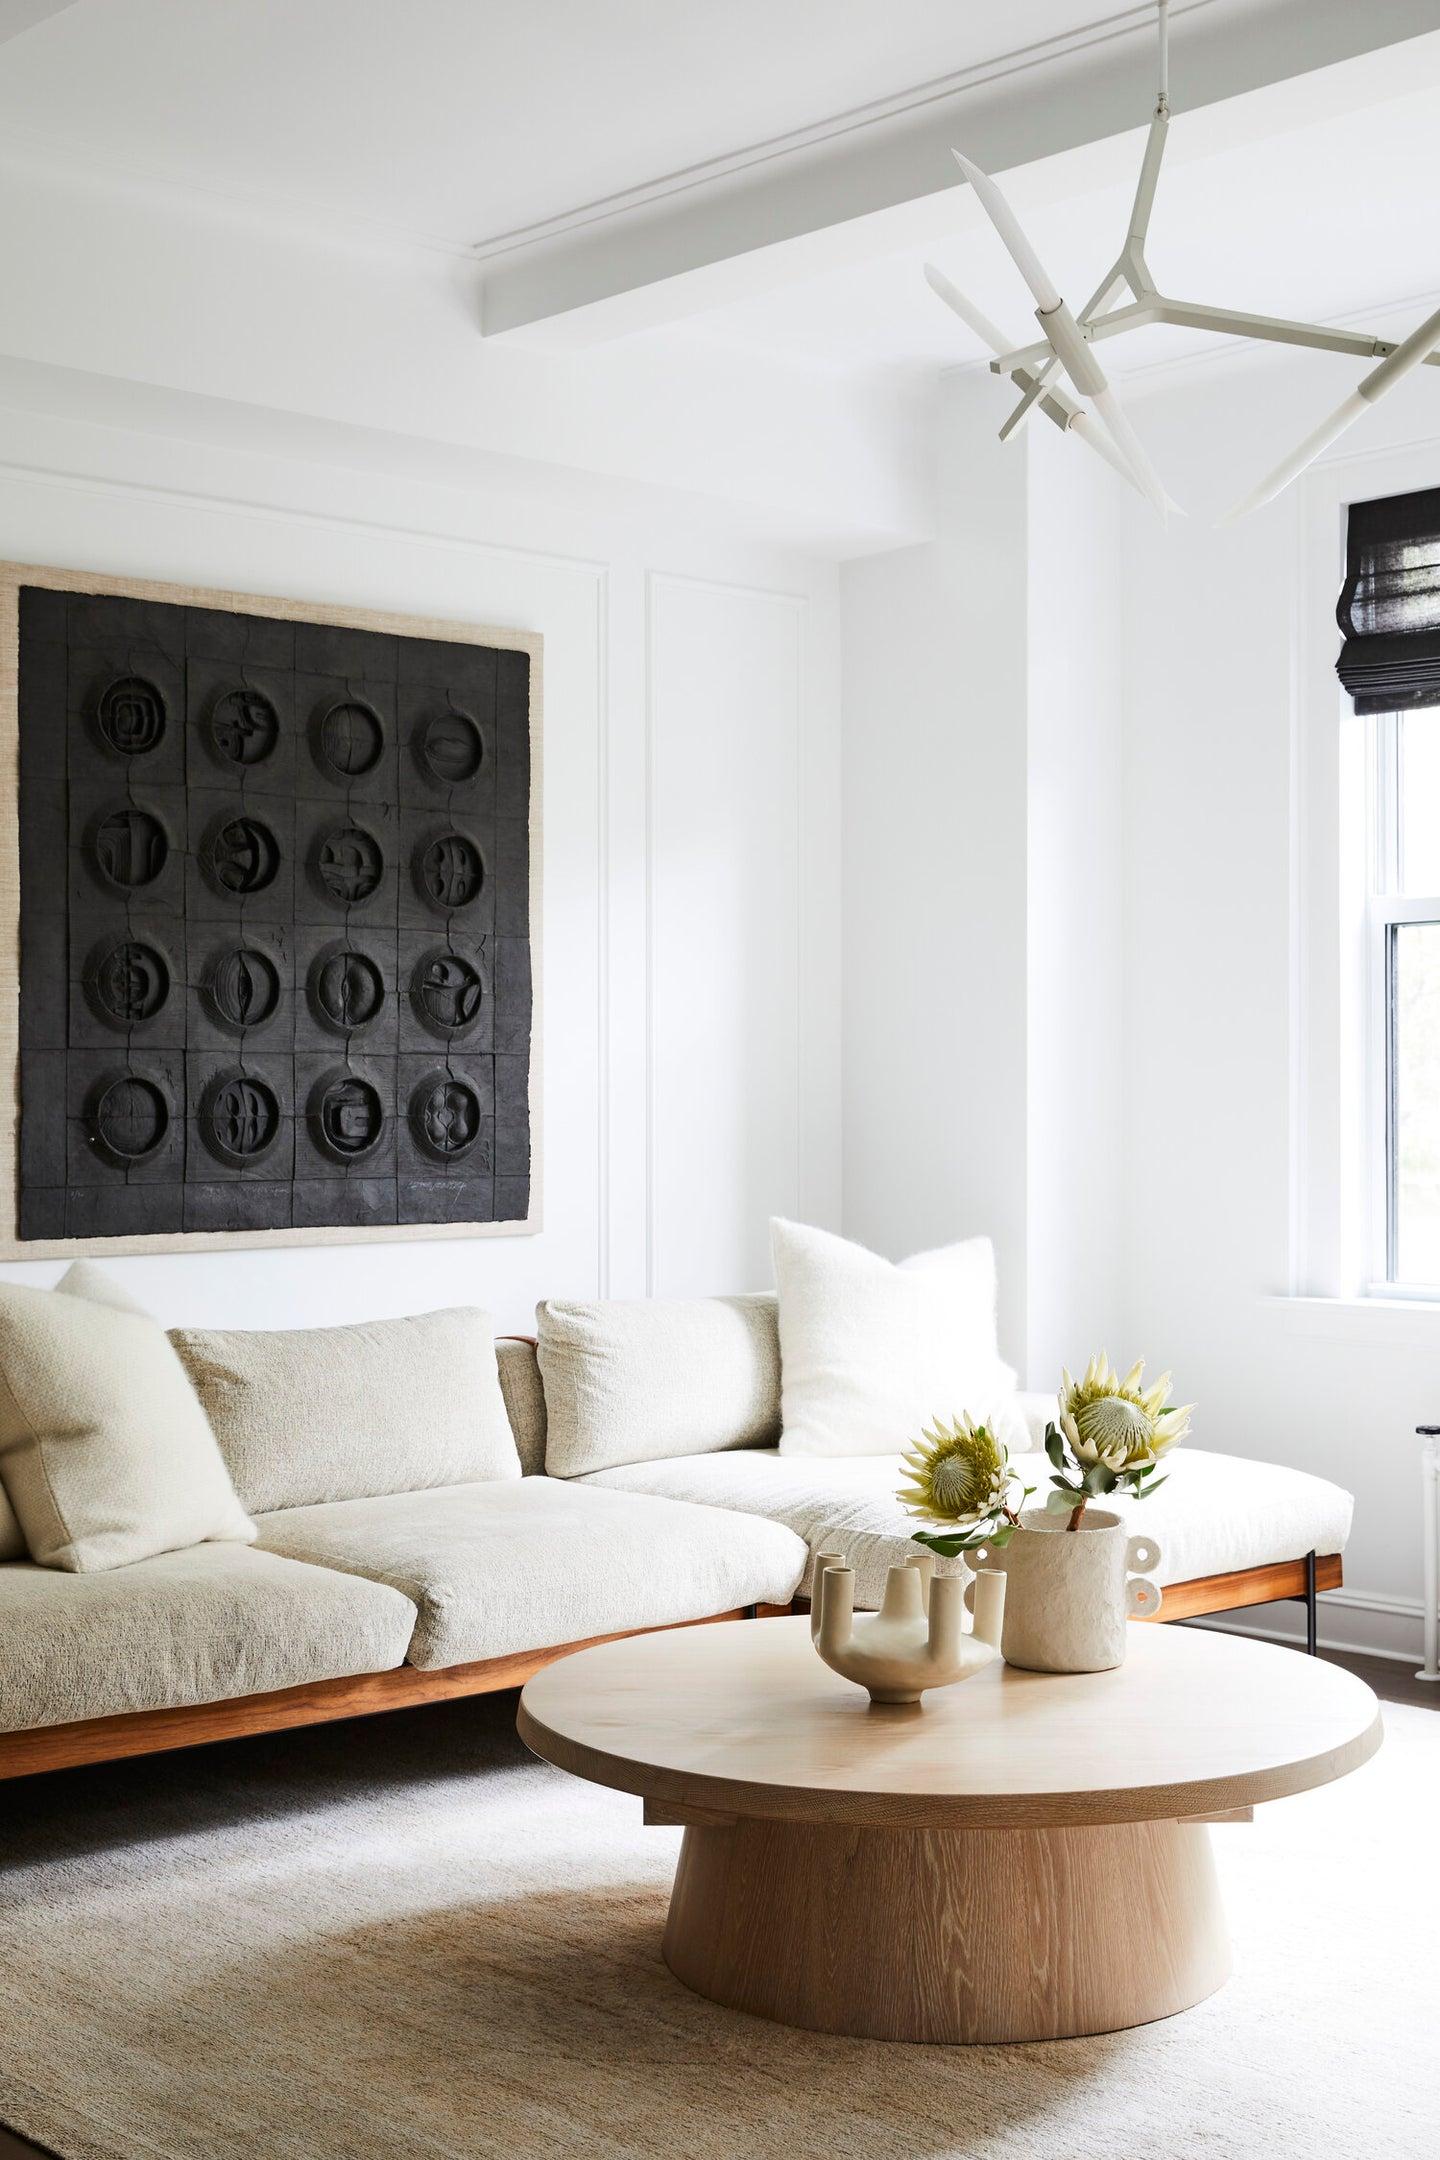 Spacious, minimal living space